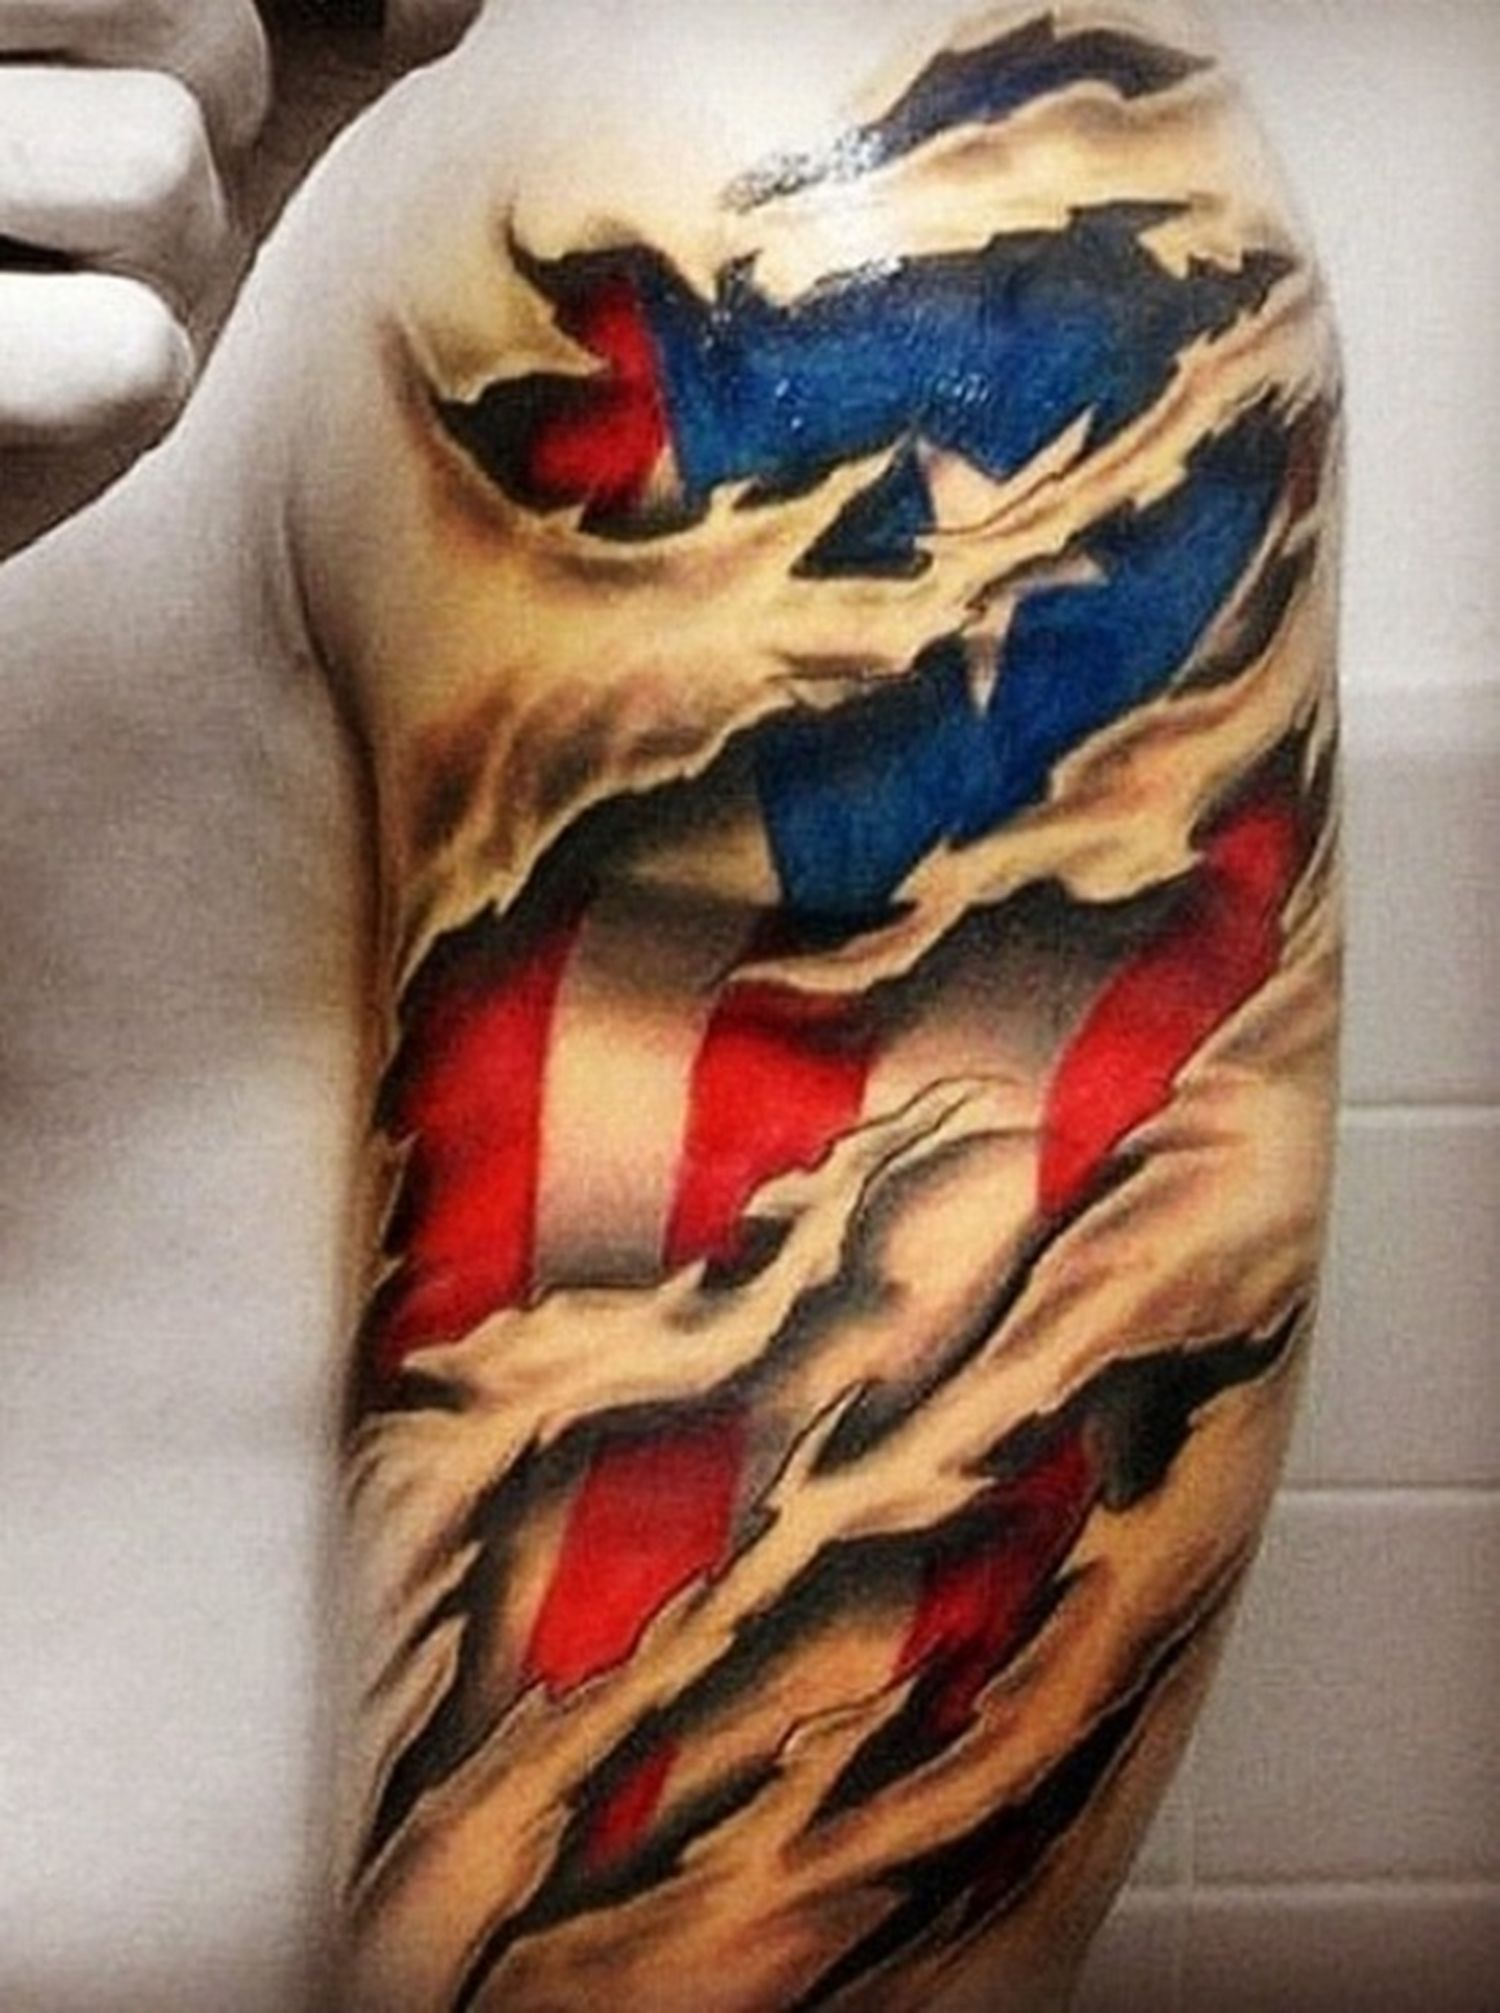 3d tattoo designs - Best 25 3d Tattoos For Men Ideas On Pinterest Mechanical Arm Tattoo Biomechanical Tattoos And Steampunk Tattoo Sleeve